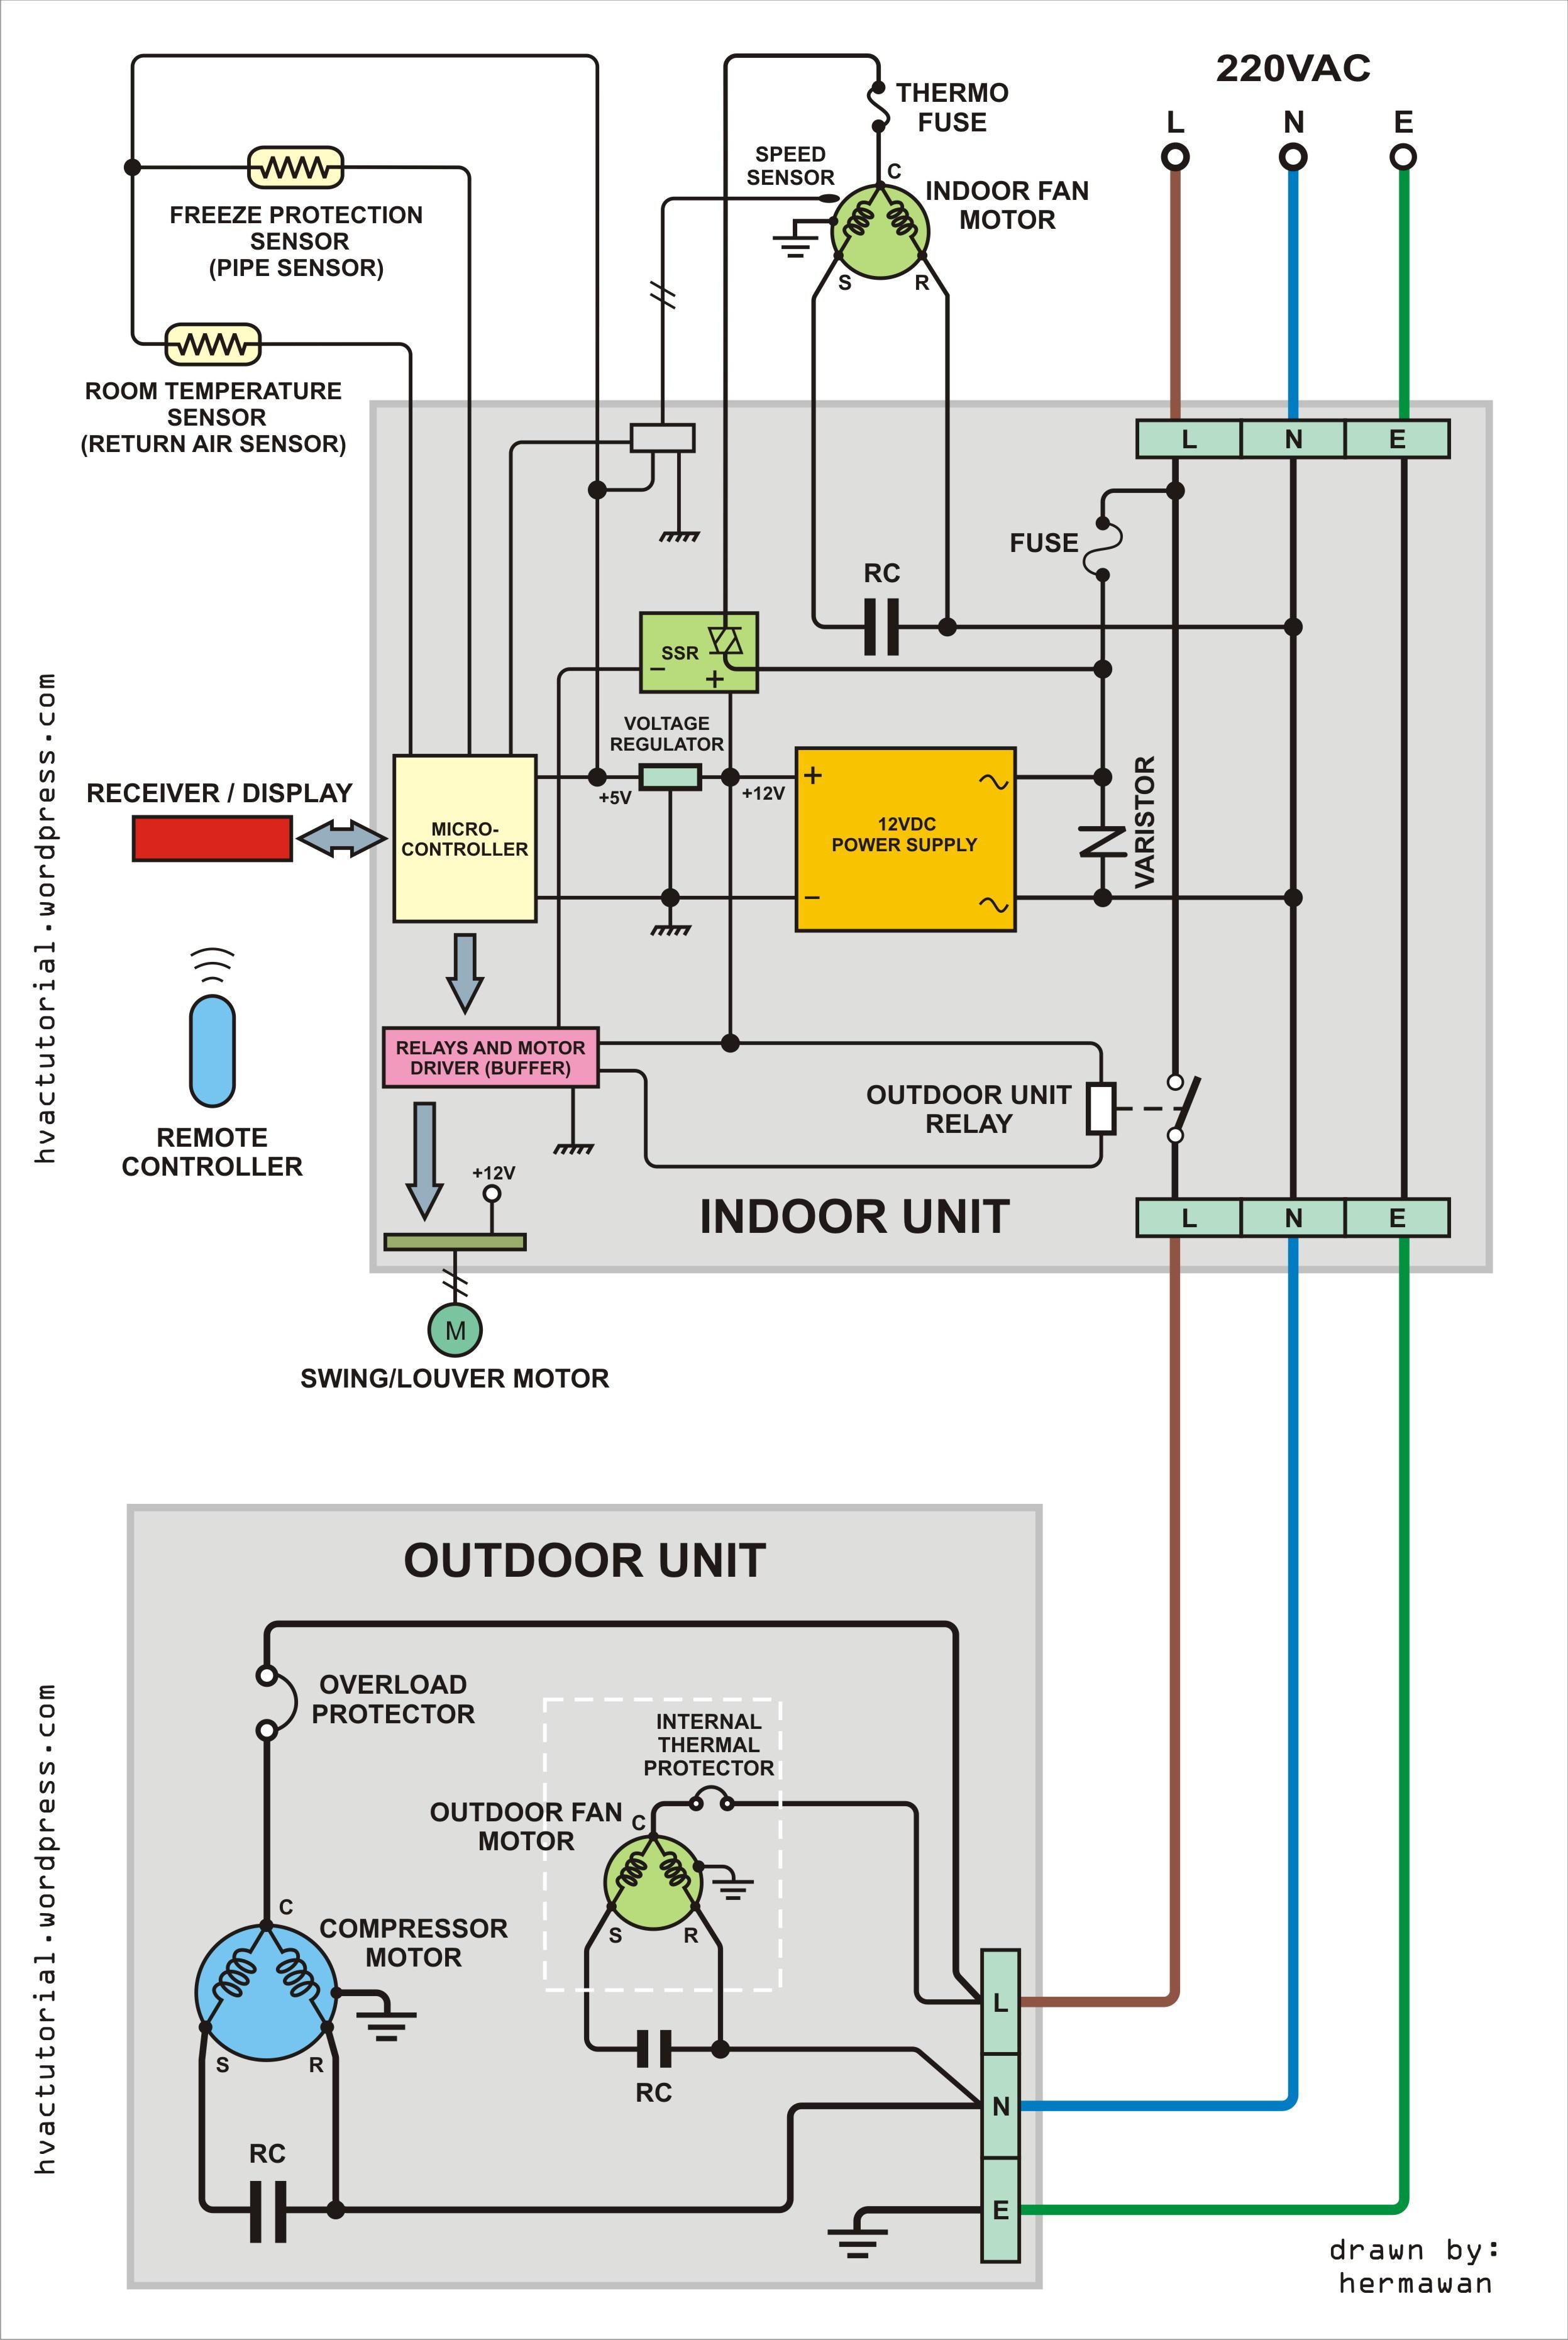 Air Conditioner Wiring Diagram Pdf Air Conditioning Schematic Diagram Wiring Diagram Local